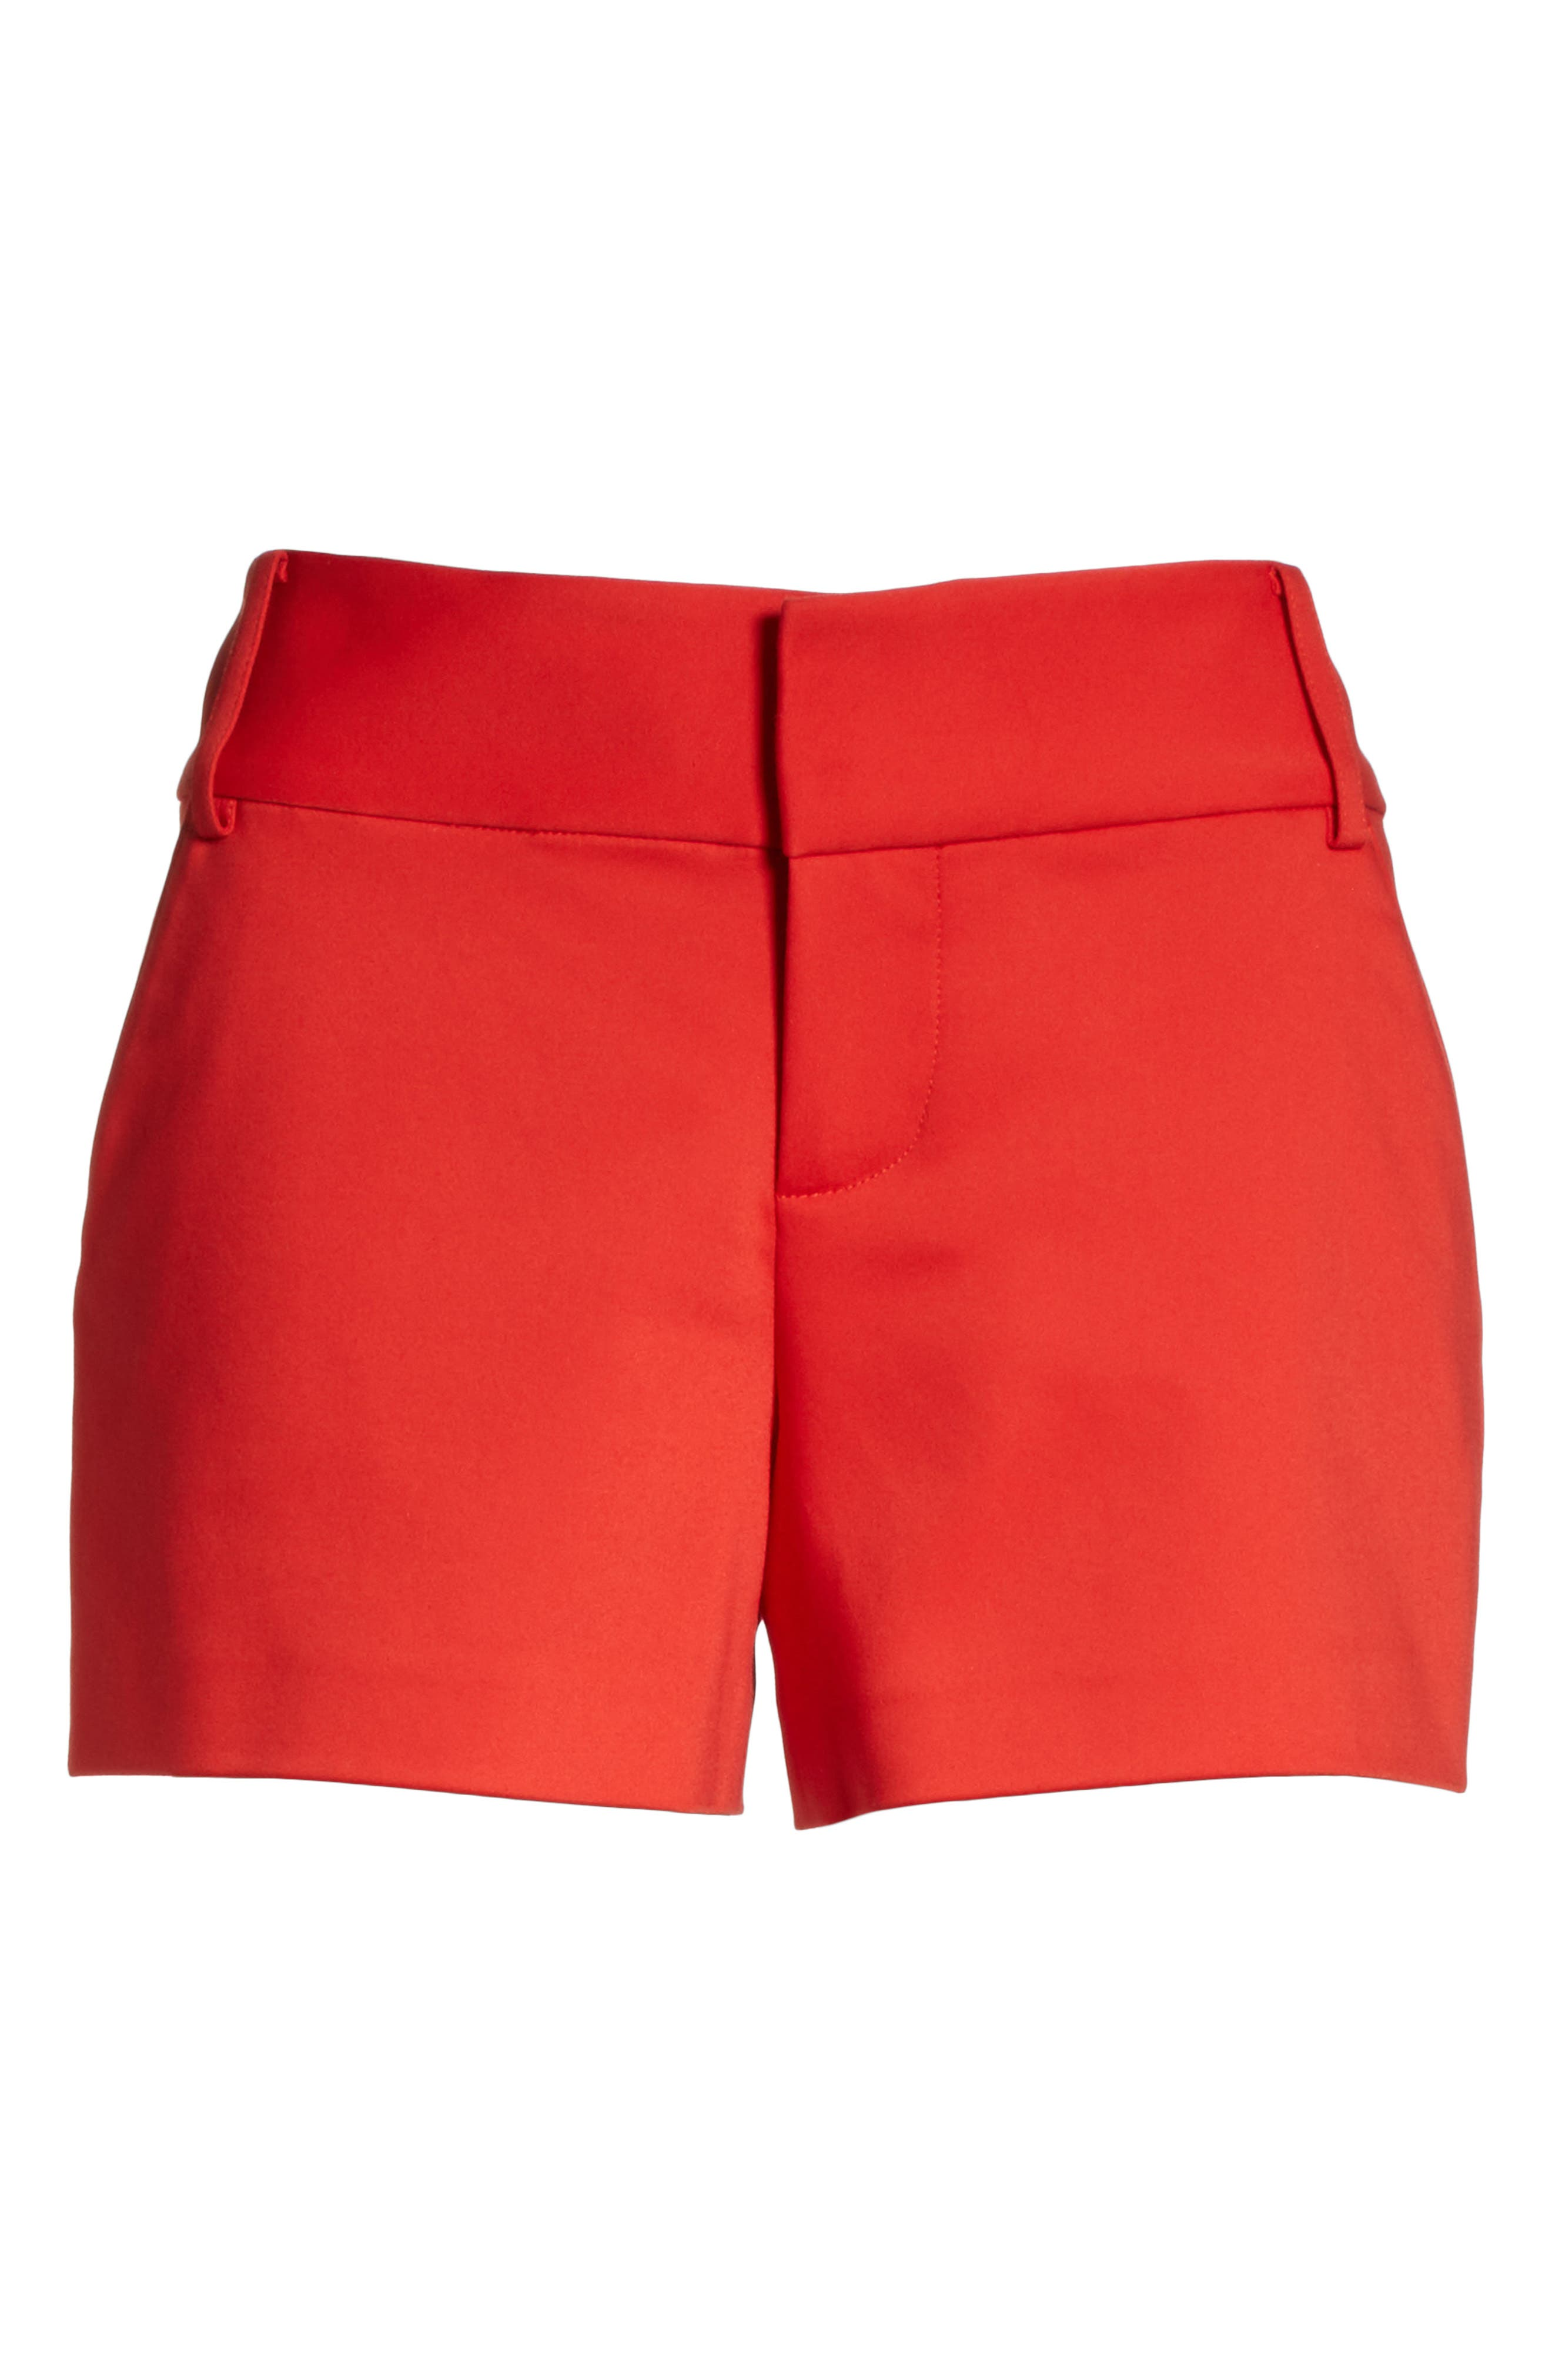 Cady Shorts,                             Alternate thumbnail 6, color,                             618